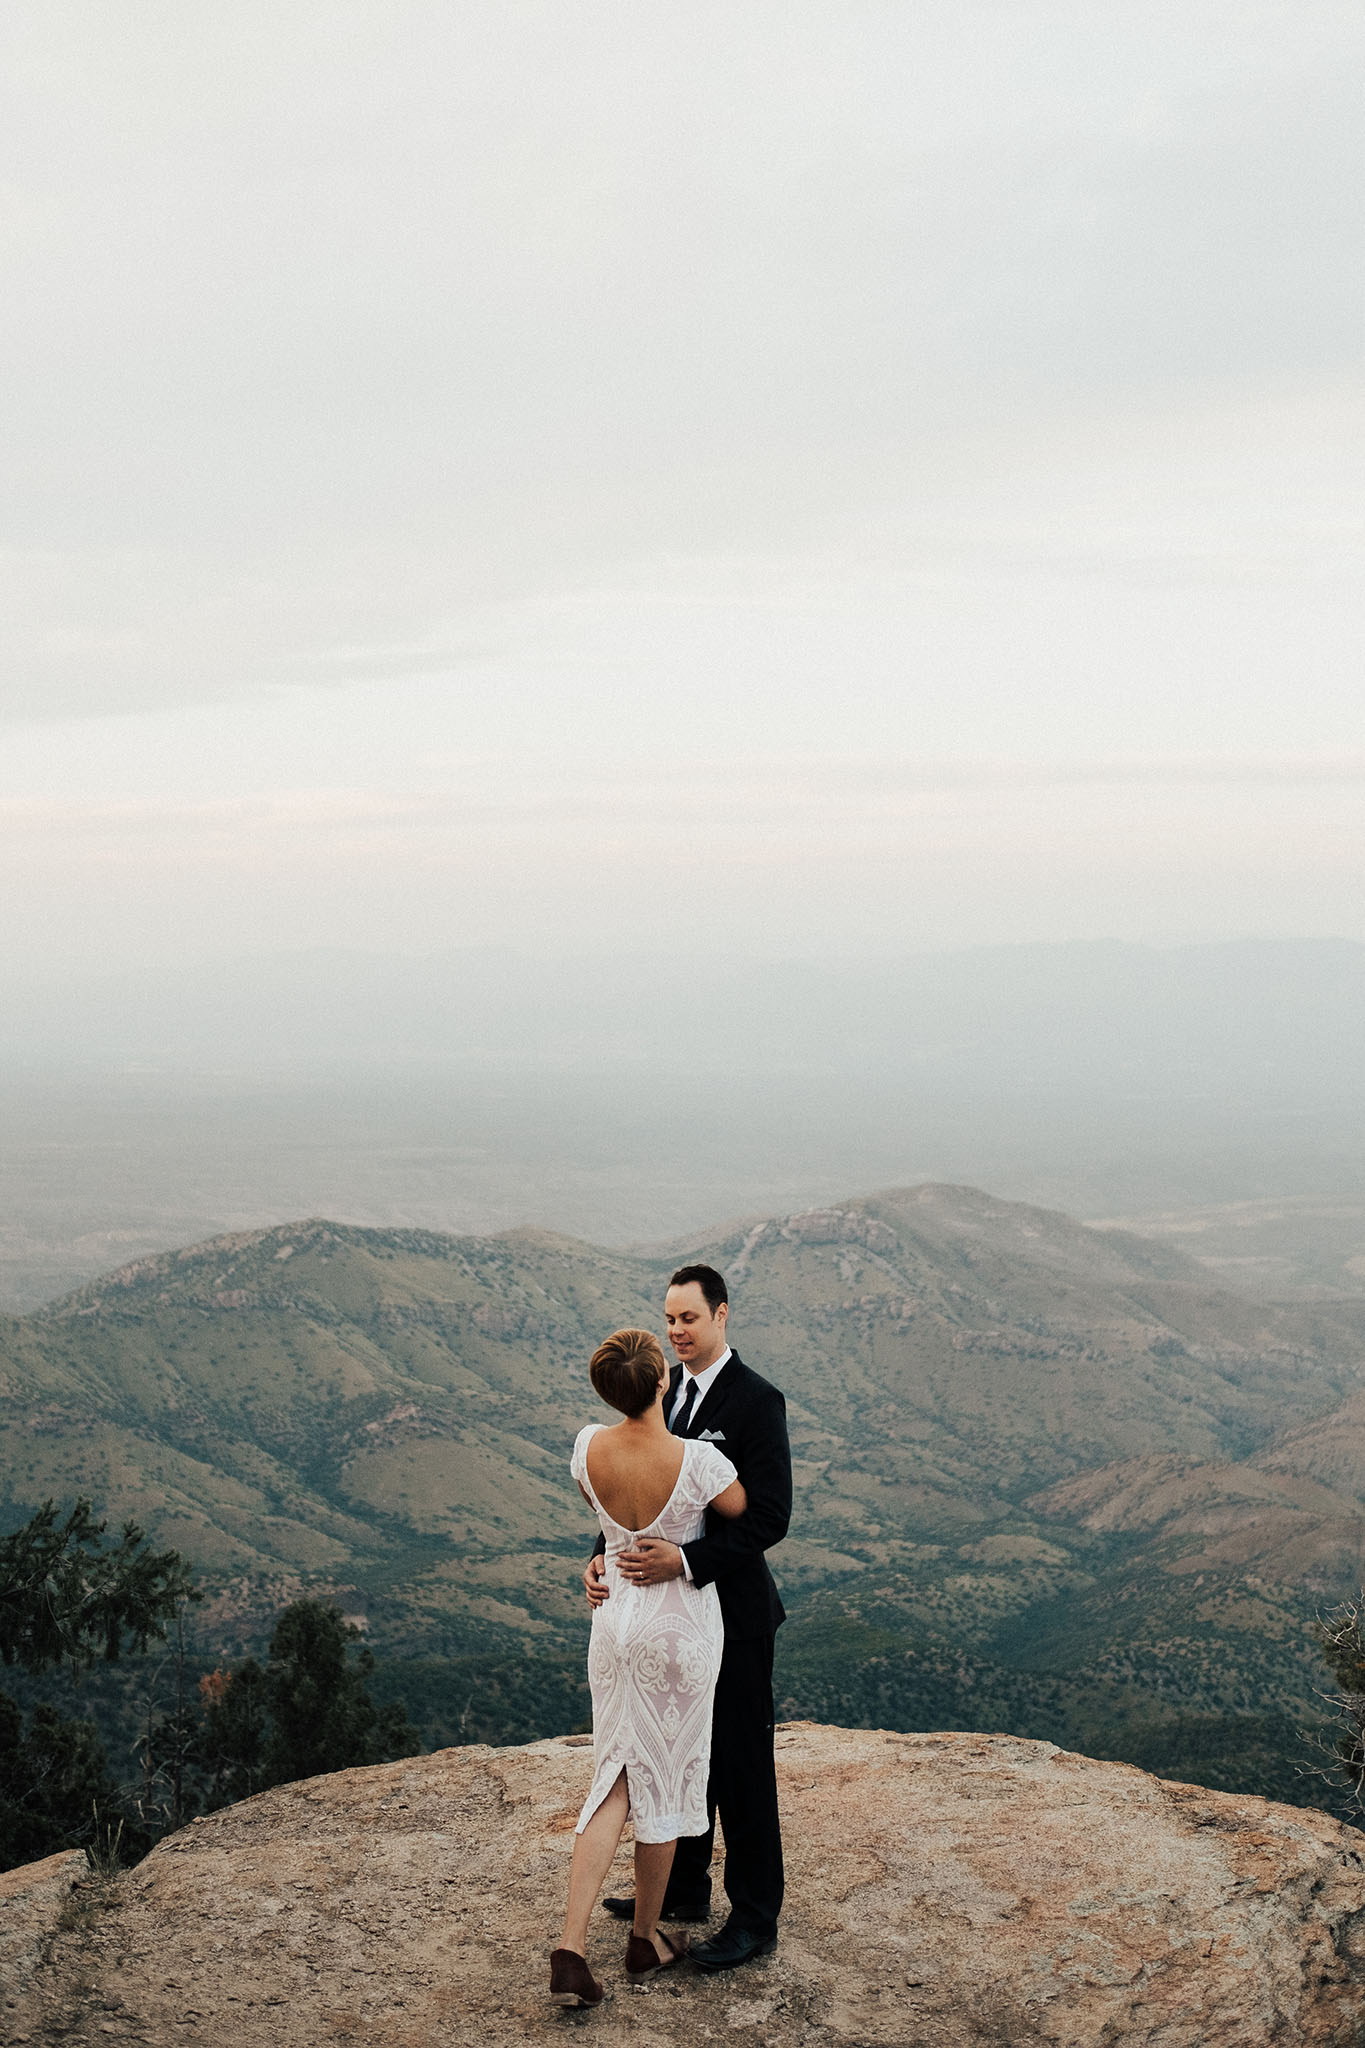 Arizona-Intimate-Elopement-Adventure-Photographer-Mount-Lemmon (35).jpg